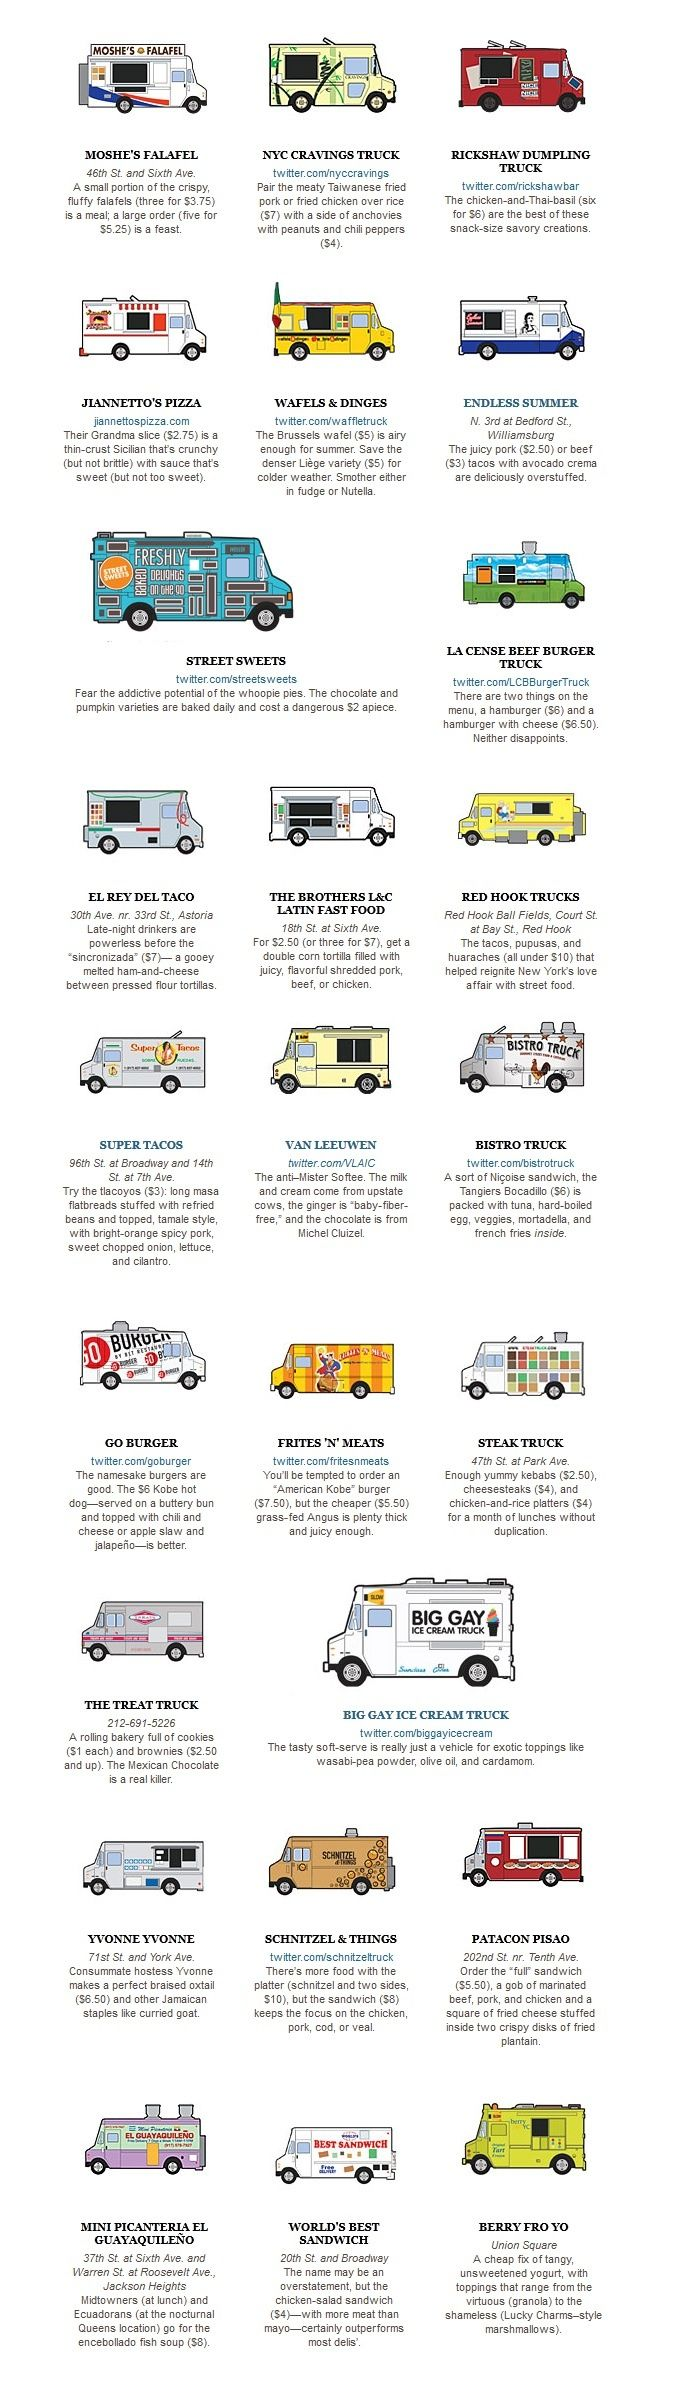 Top 25 Food Trucks in NYC: